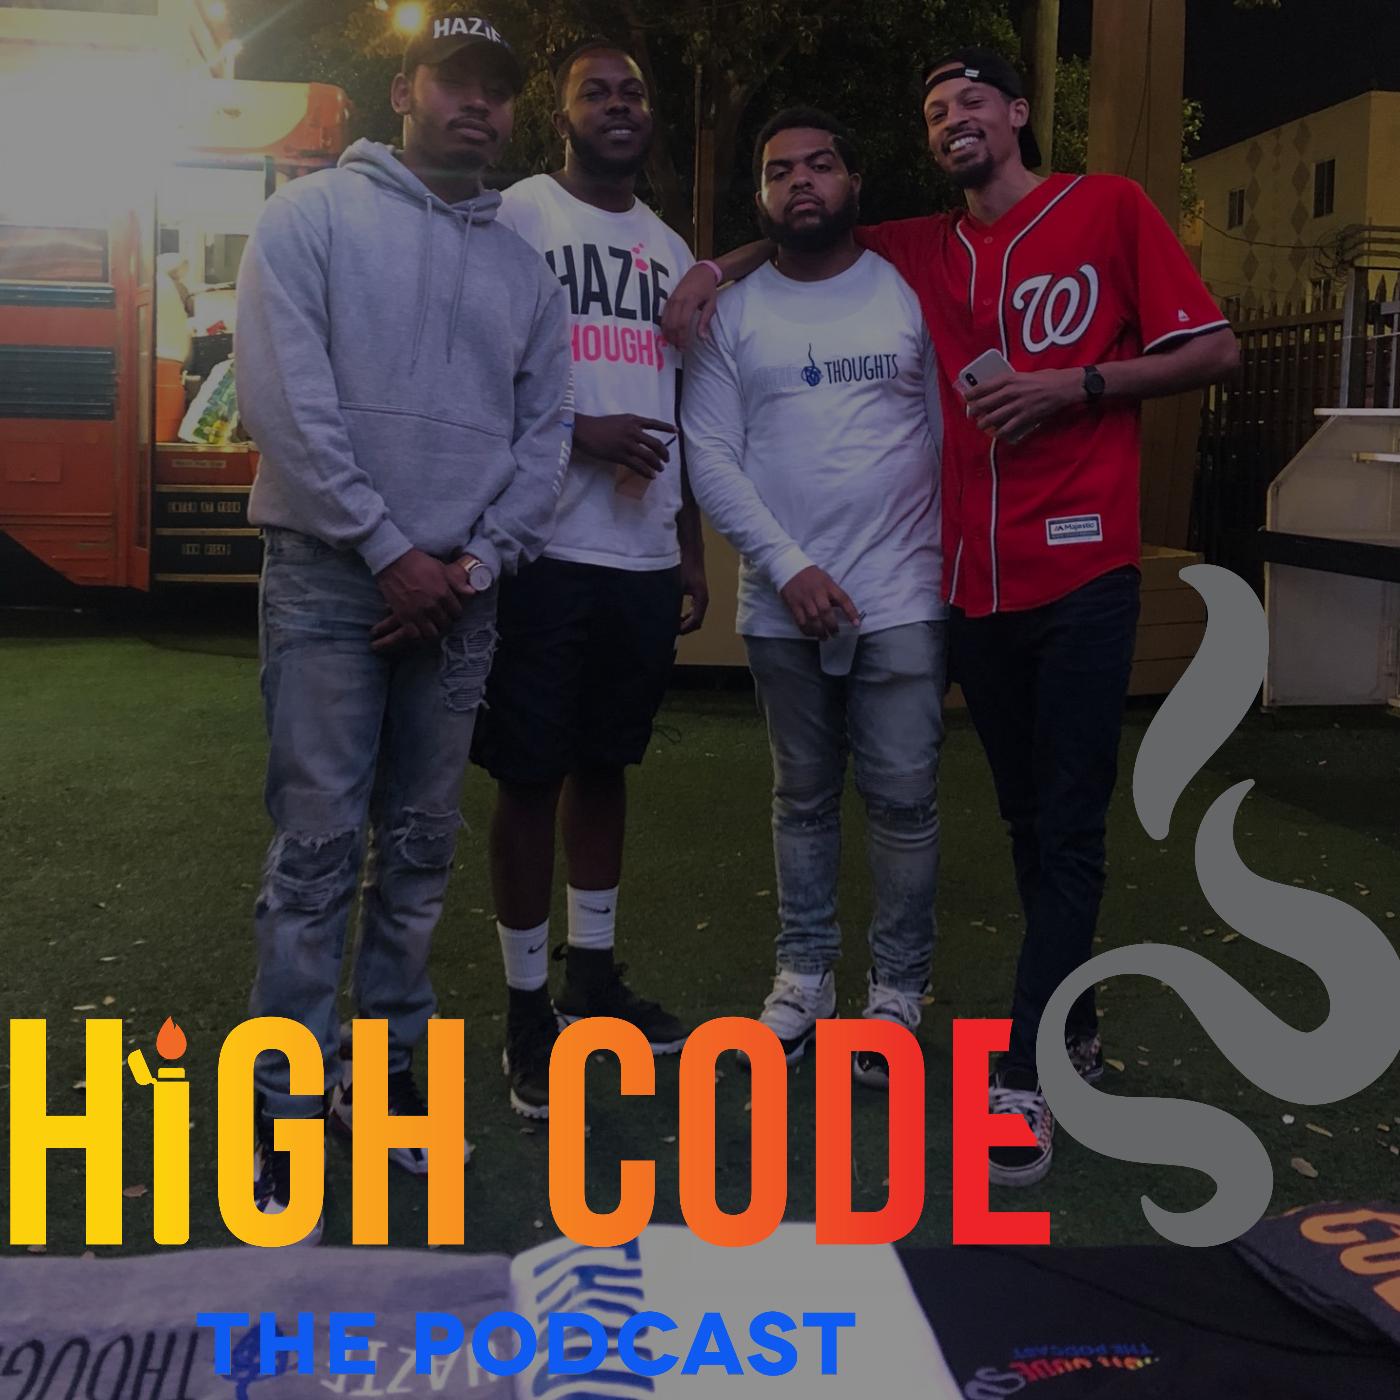 high codes podcast episode 67 art basel miami shame